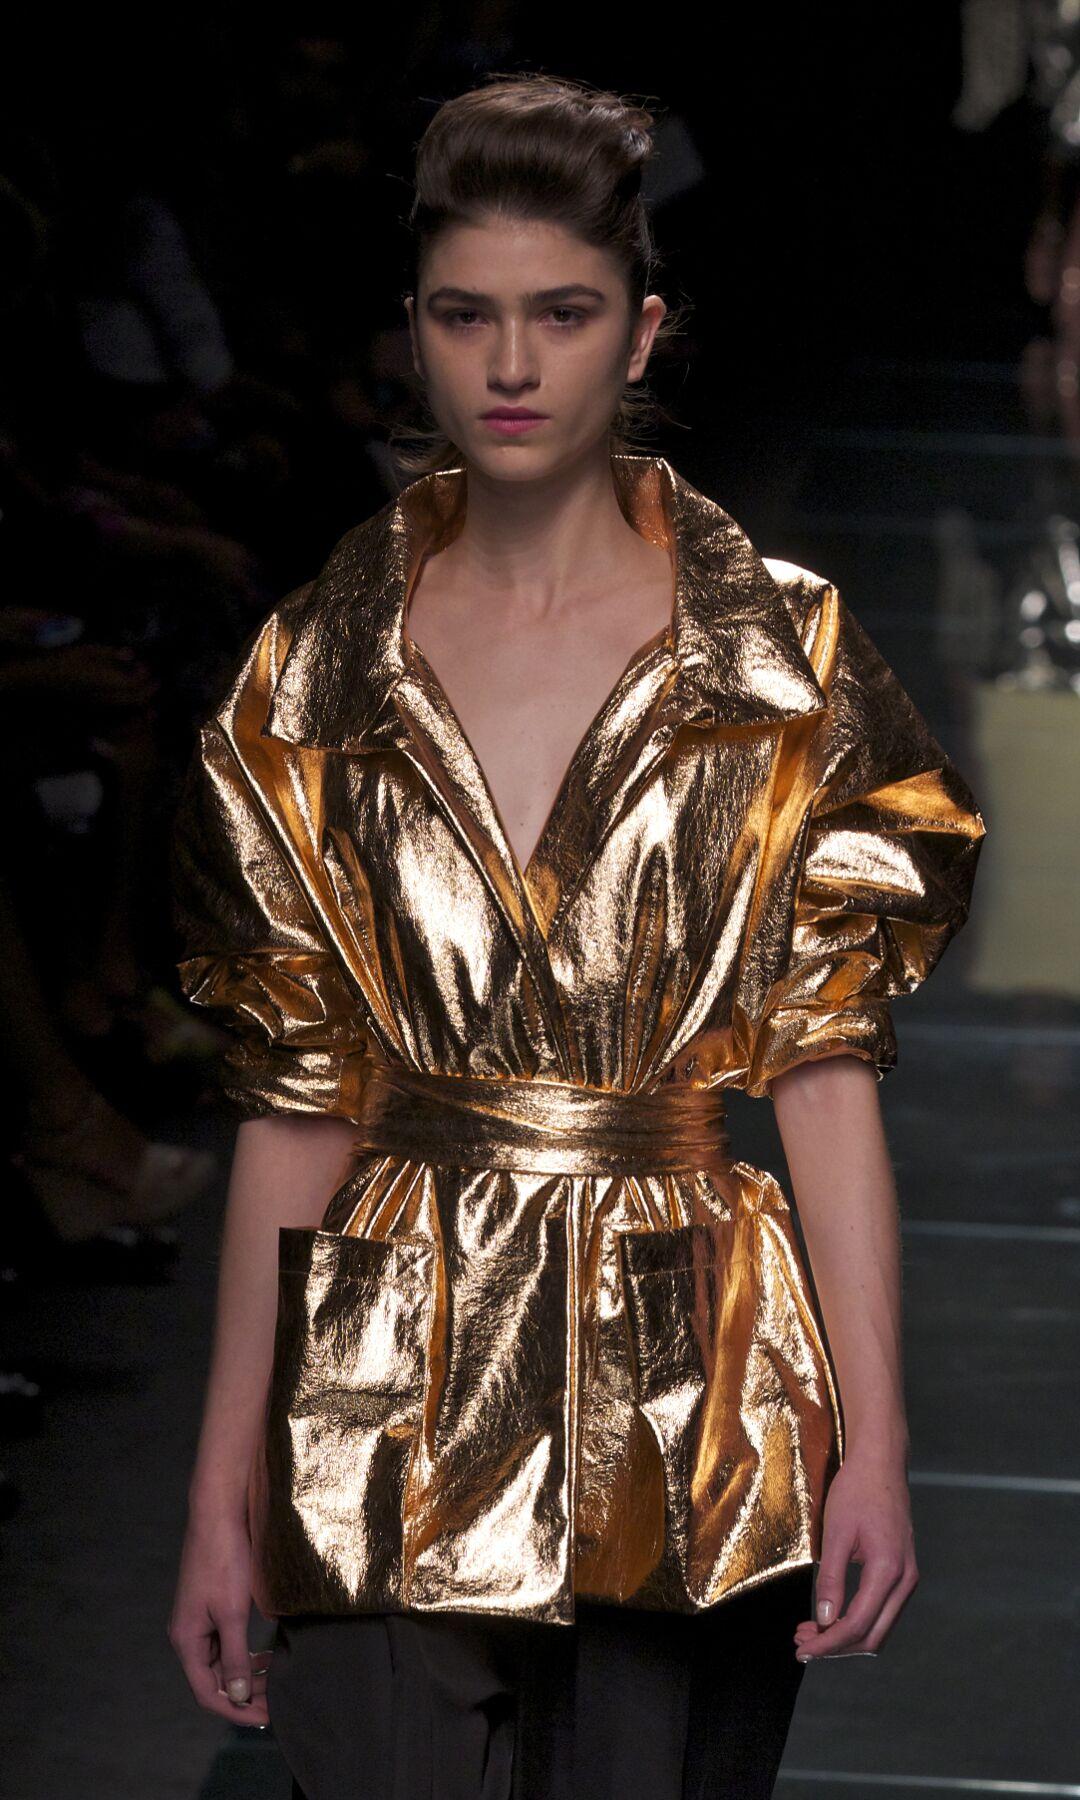 Fashion Woman Model Anteprima Catwalk